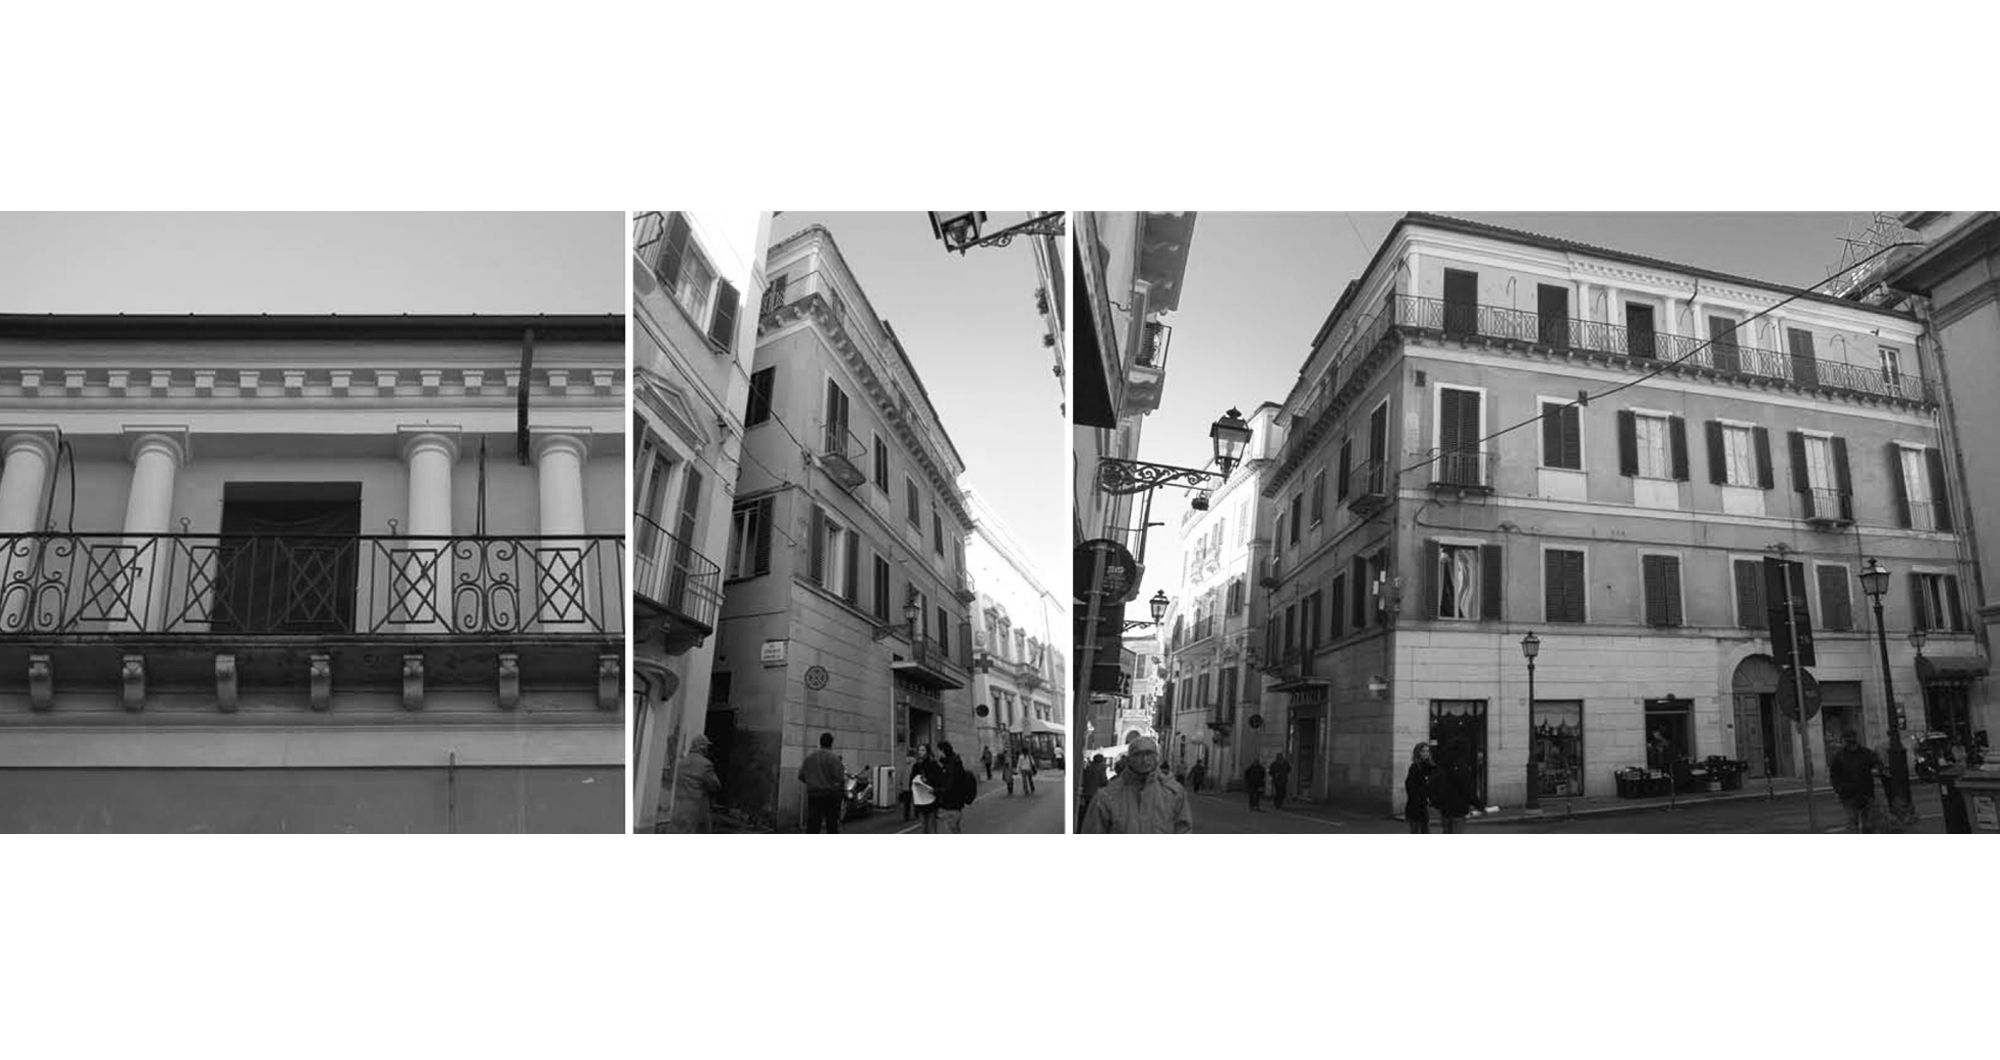 Architectural Relief